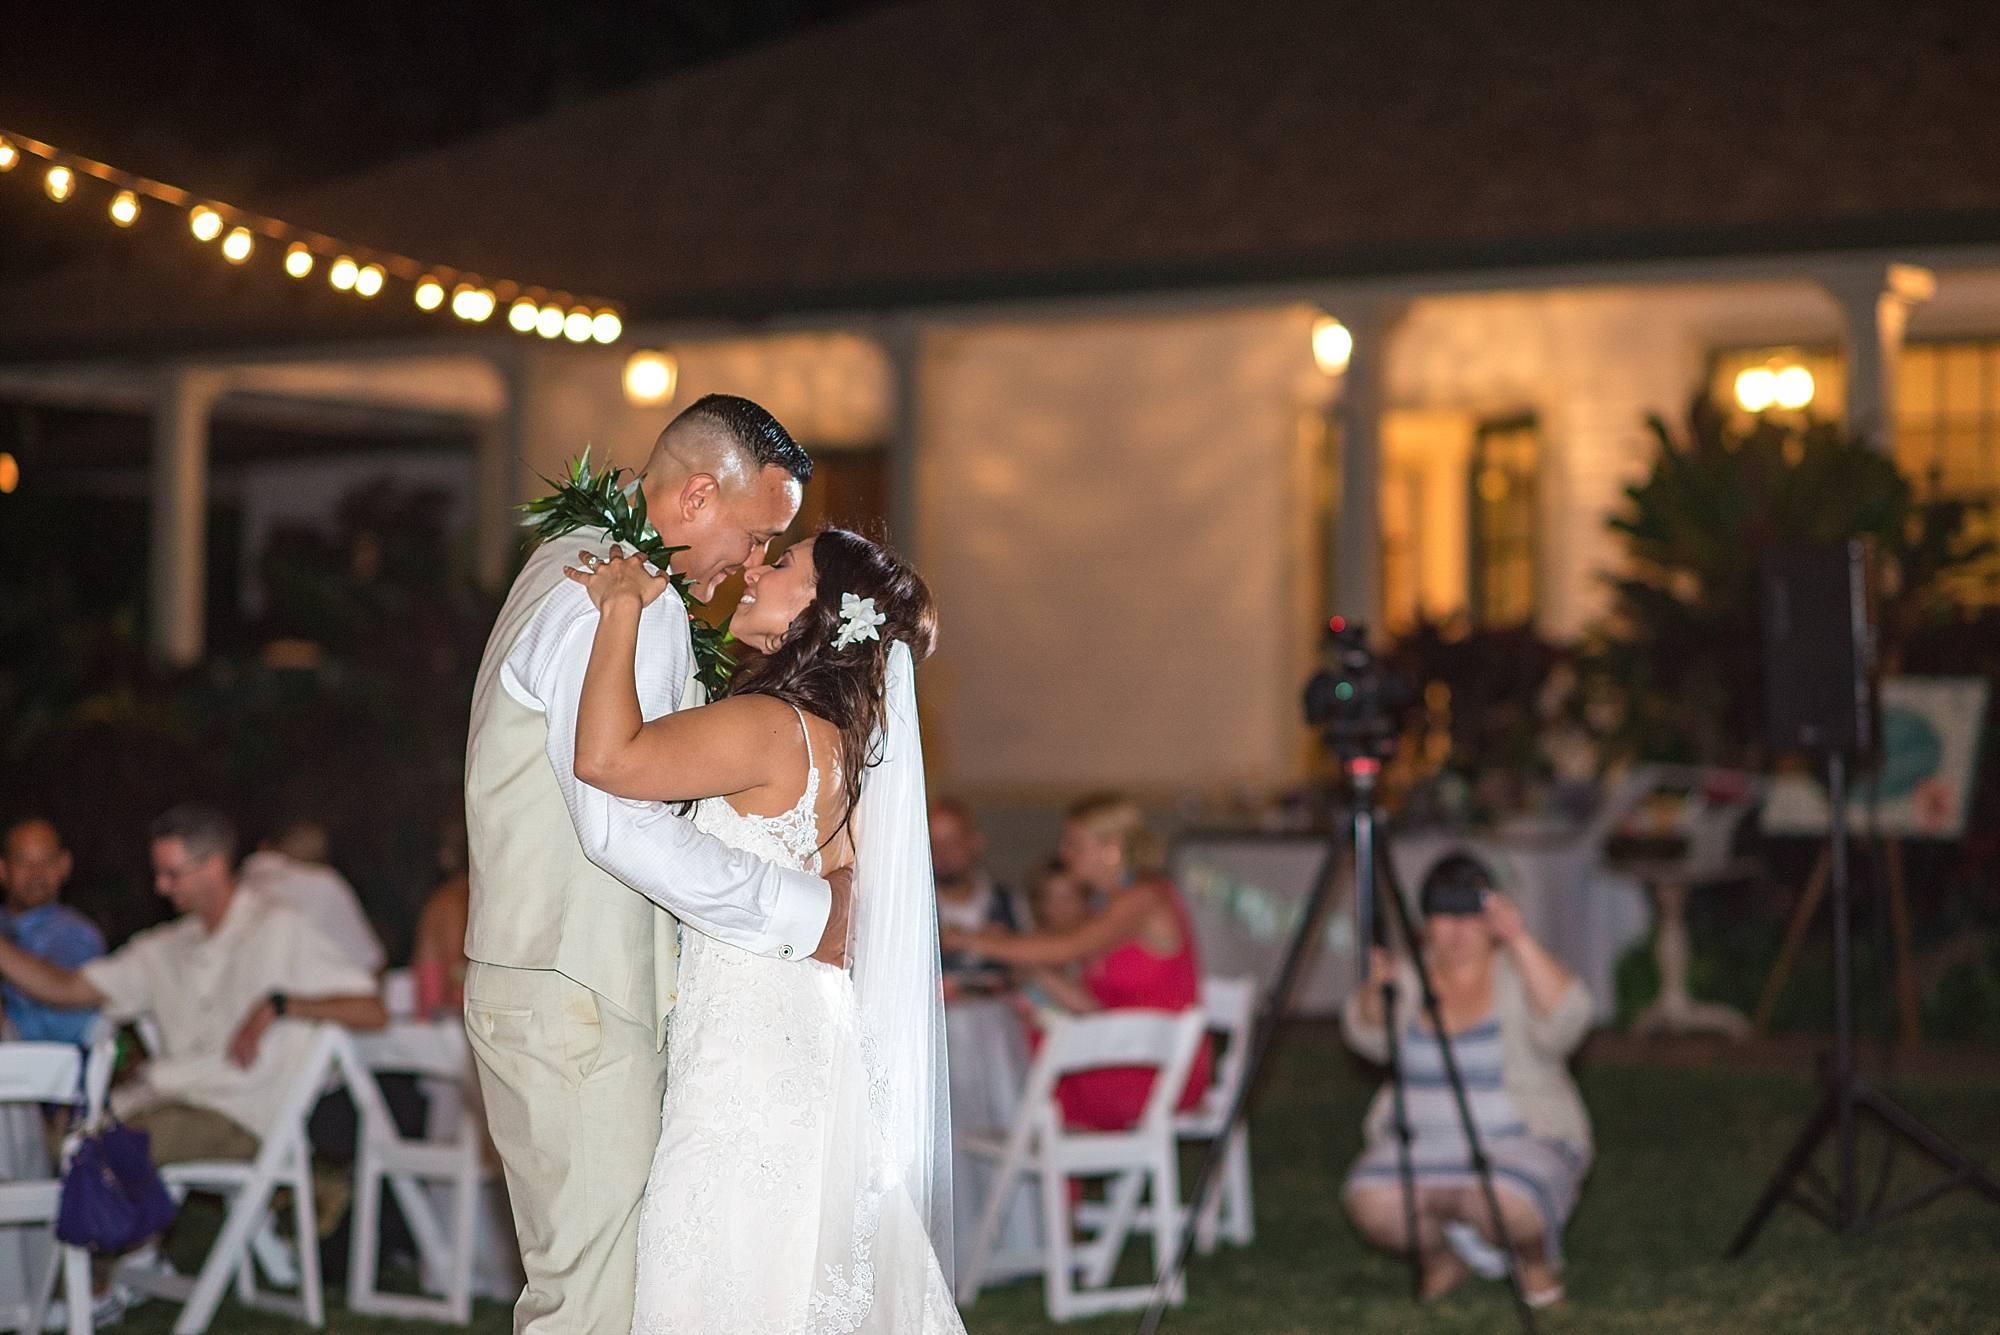 Maui wedding at Olowalu Plantation House_0151